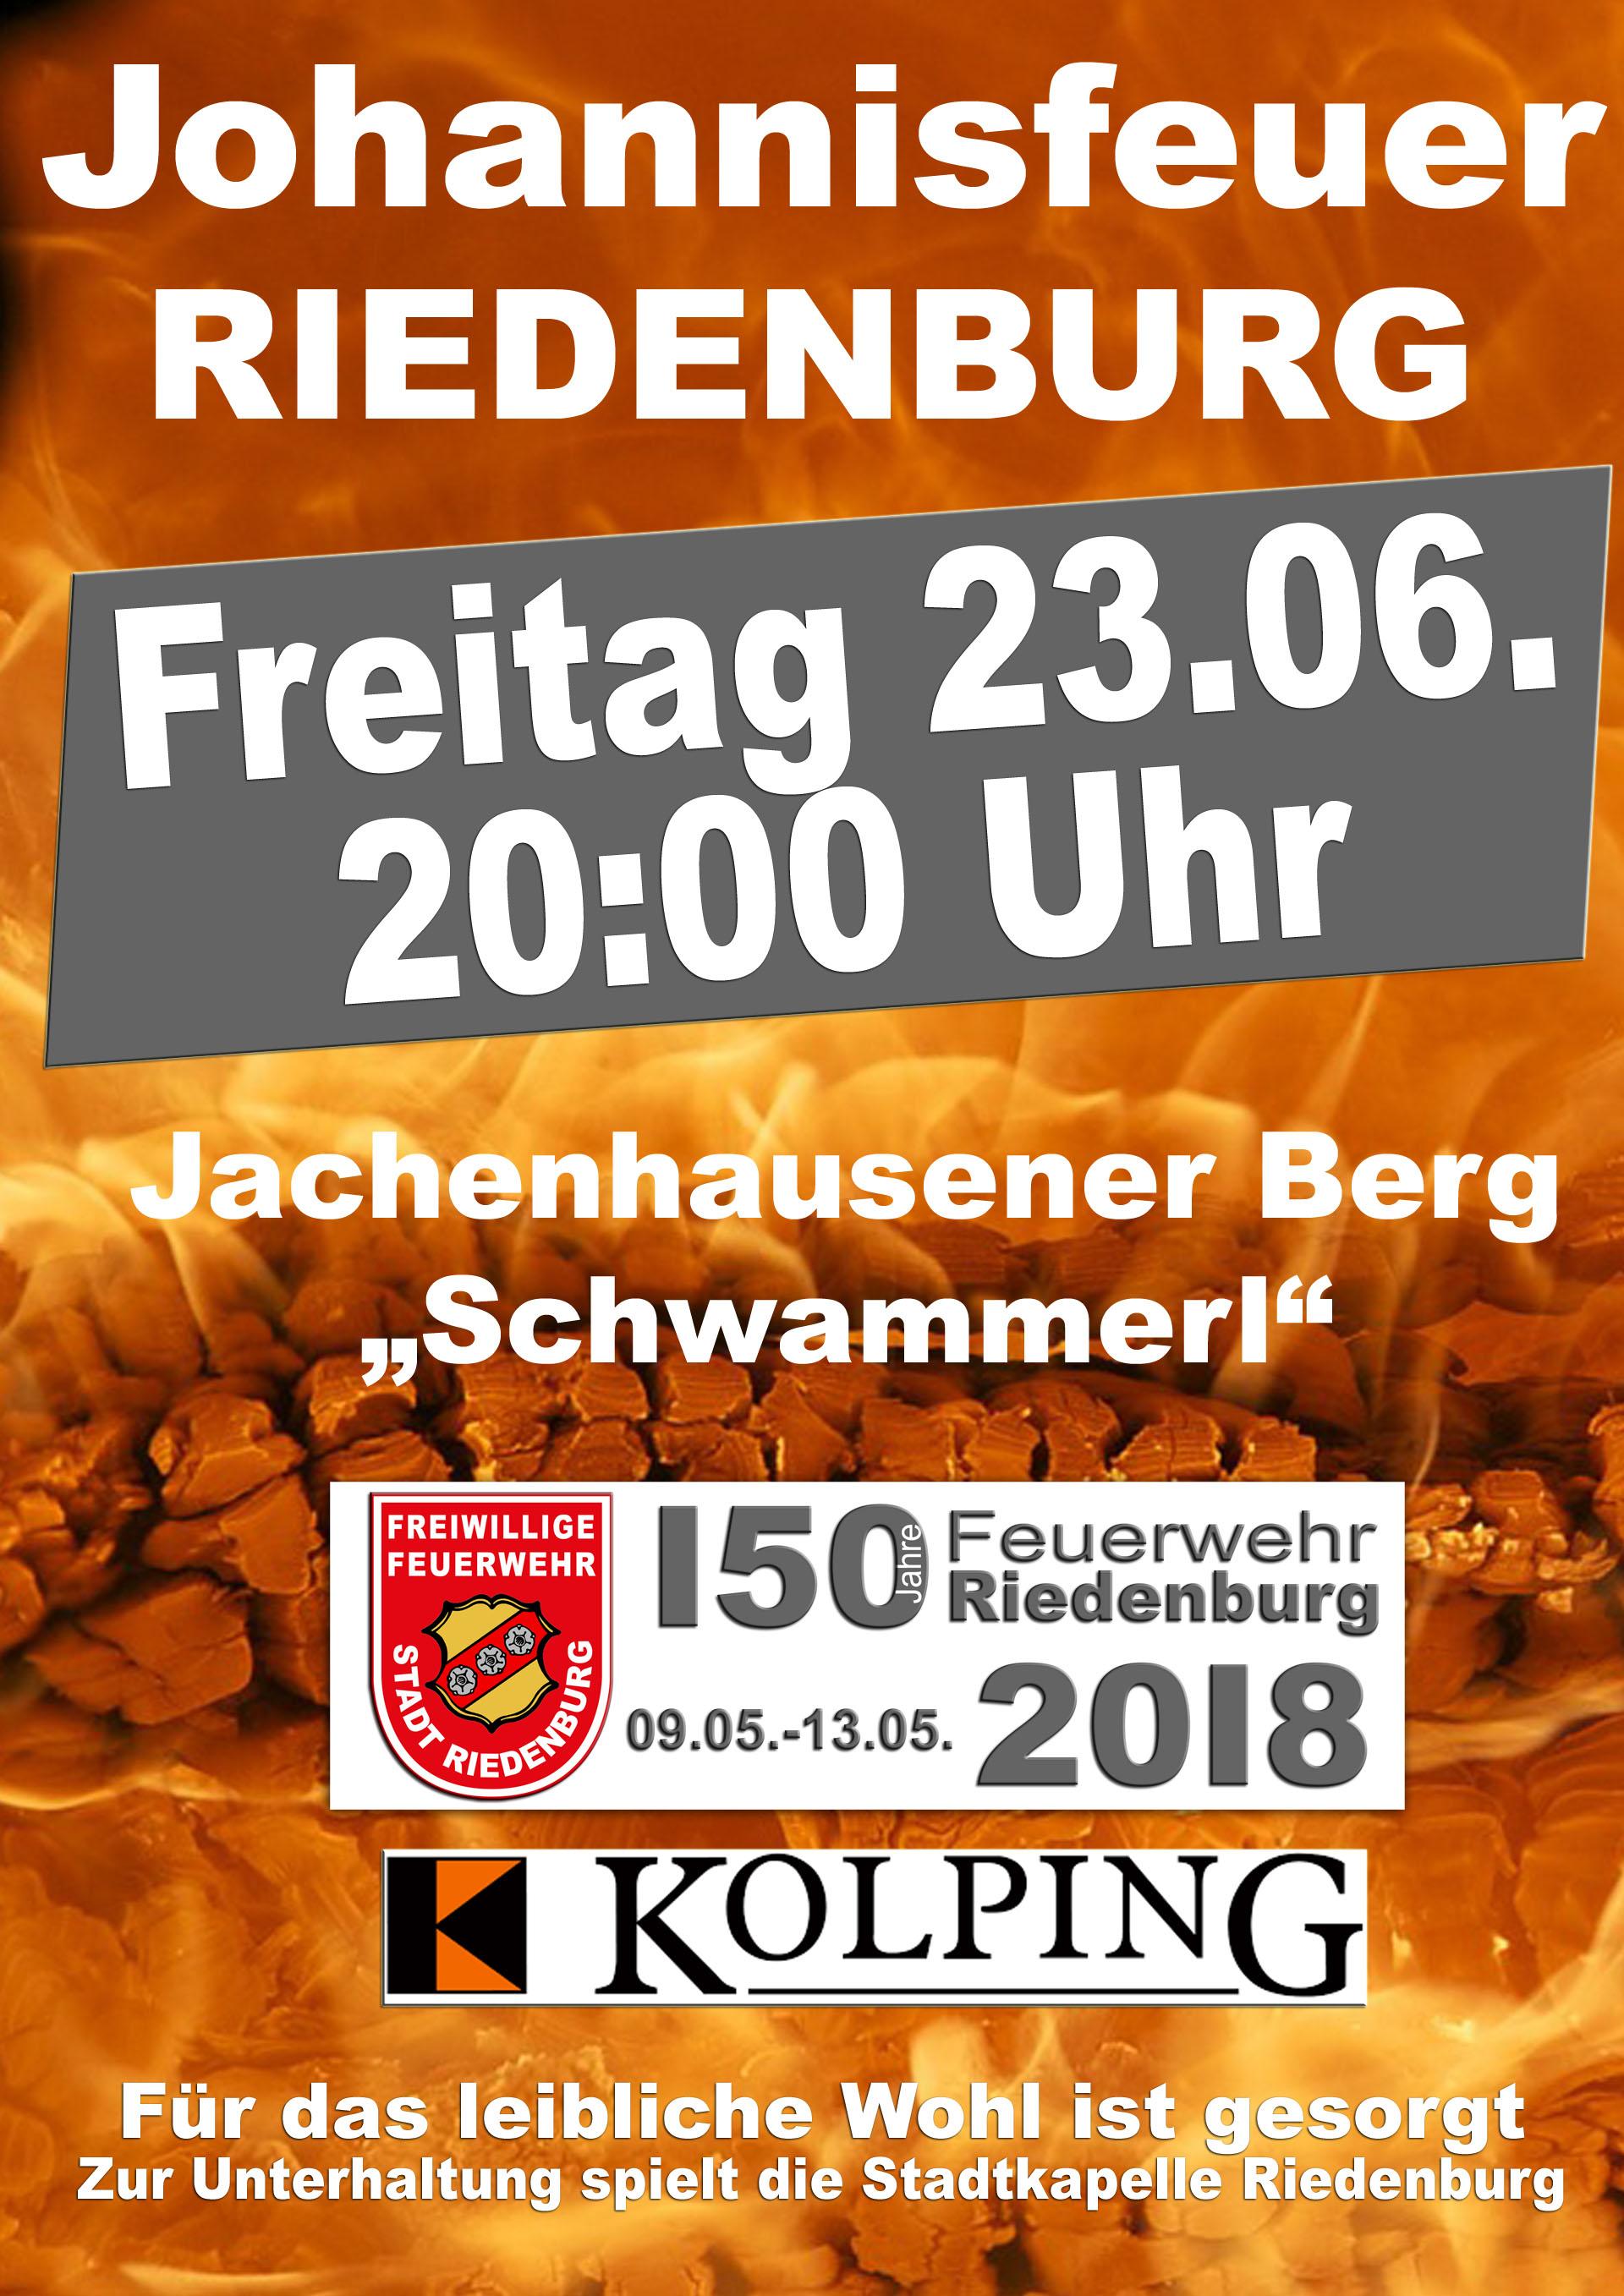 Plakat Johannisfeuer 2017-V3k